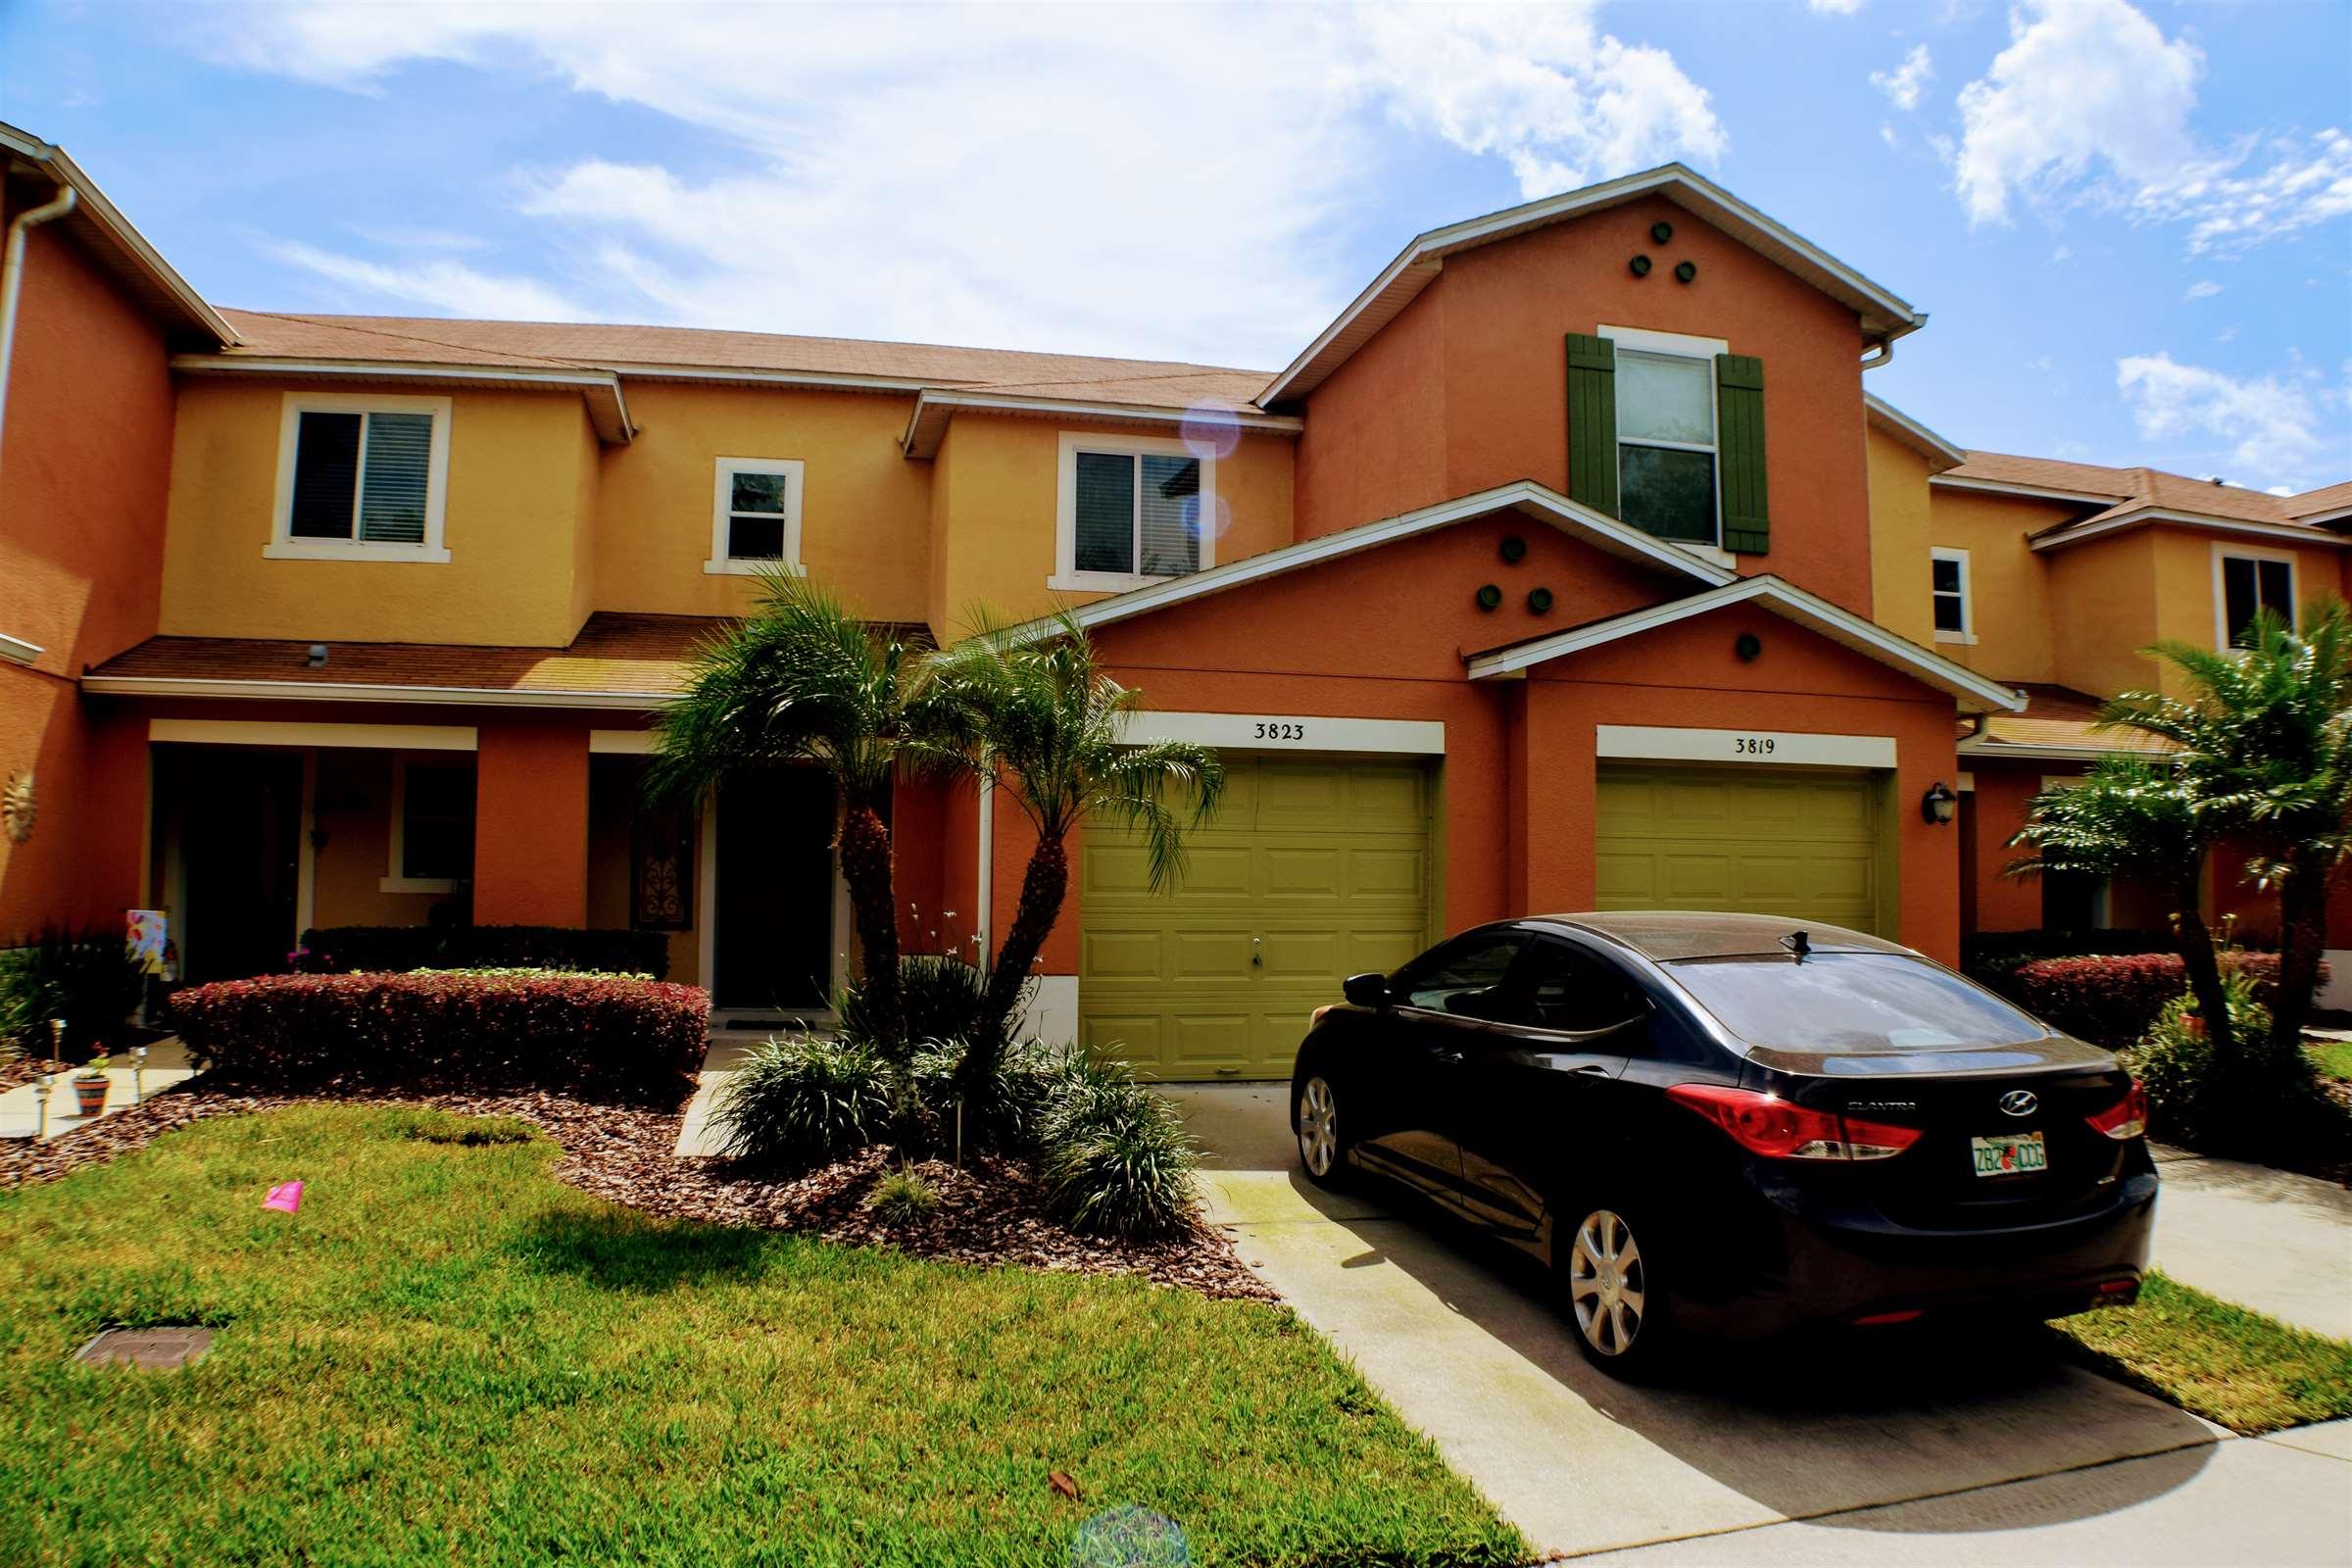 3823 Gliding Place, Sanford, FL 32773